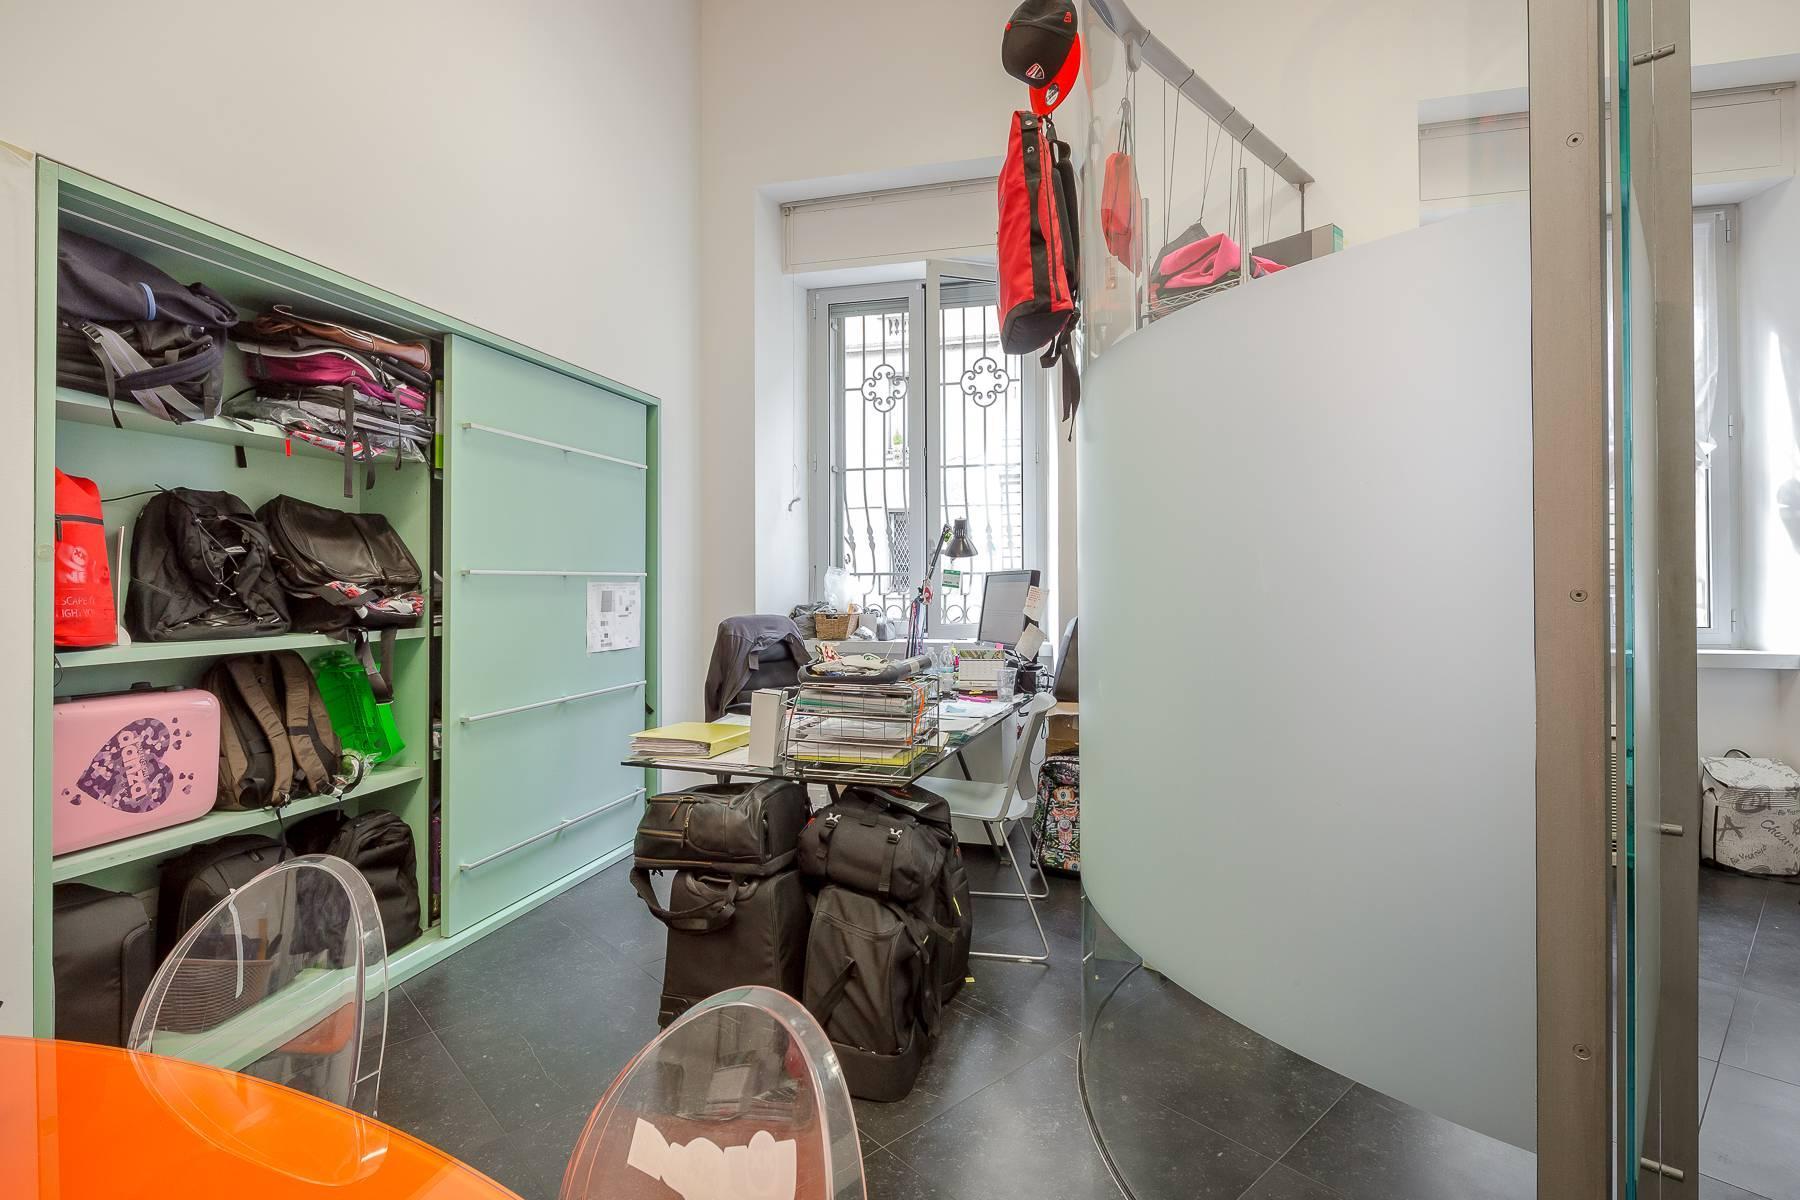 Opne-Space Büro / Wohnimmobilie auf der Piazza Giovine Italia / Via Aurelio Saffi - 22